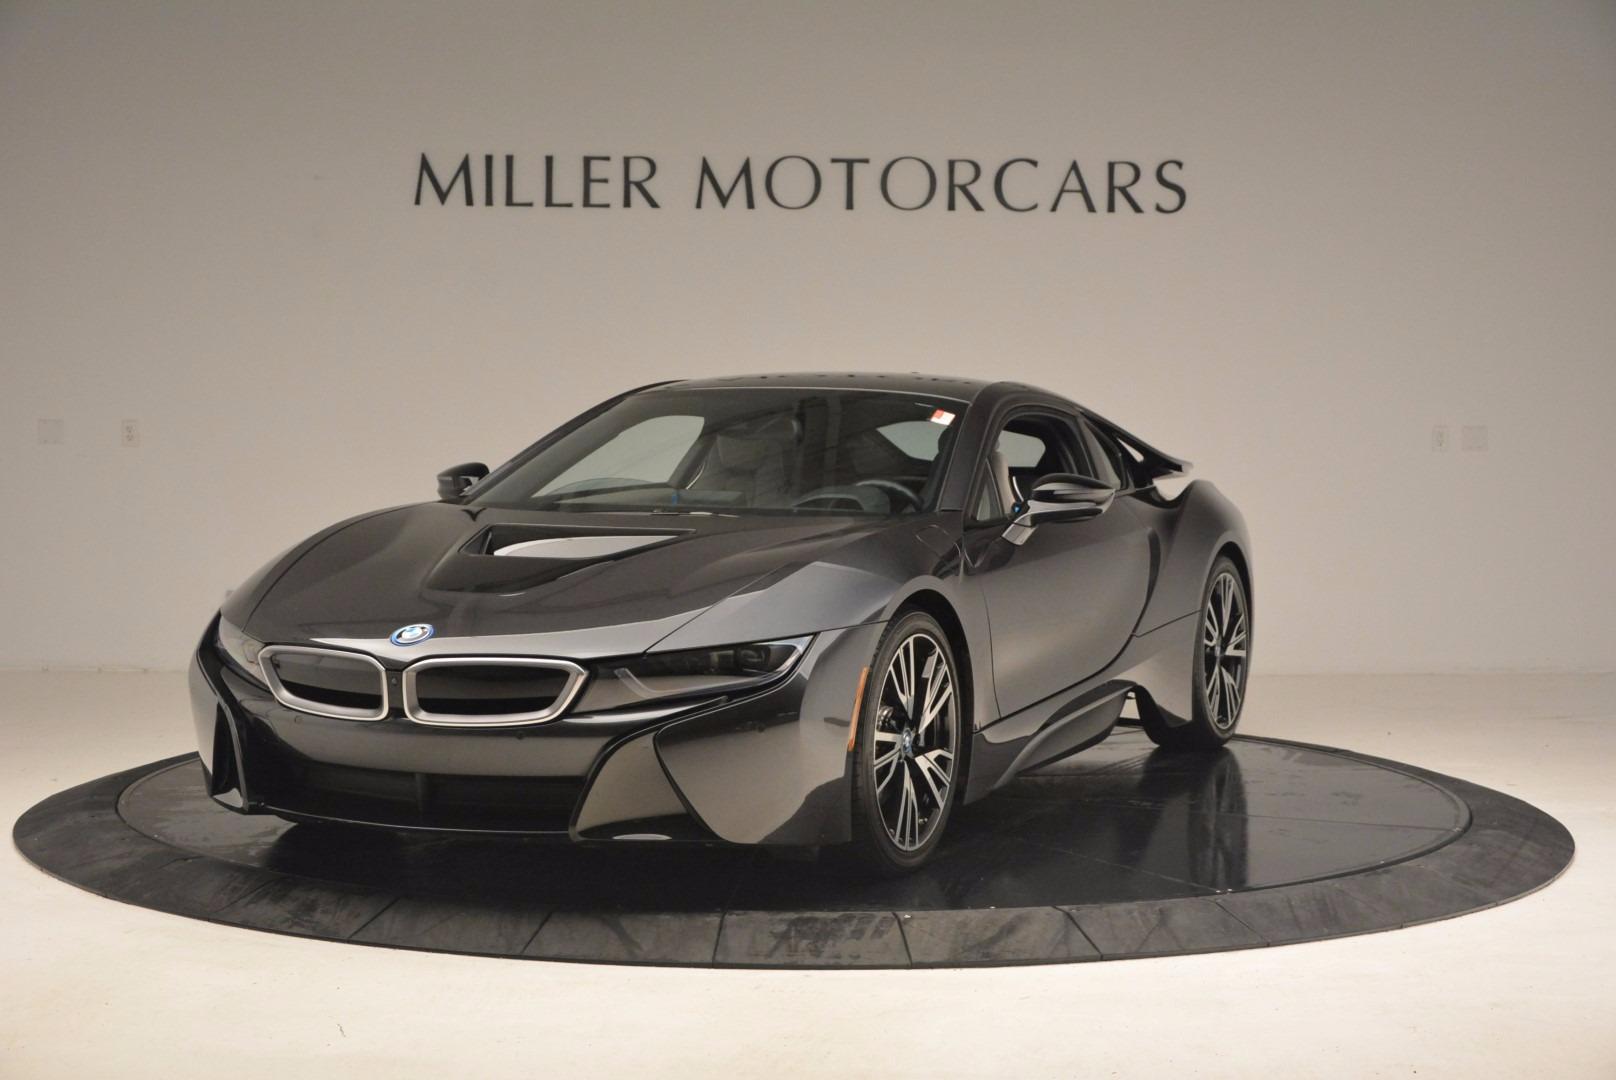 Used 2014 BMW i8 for sale Sold at Alfa Romeo of Westport in Westport CT 06880 1